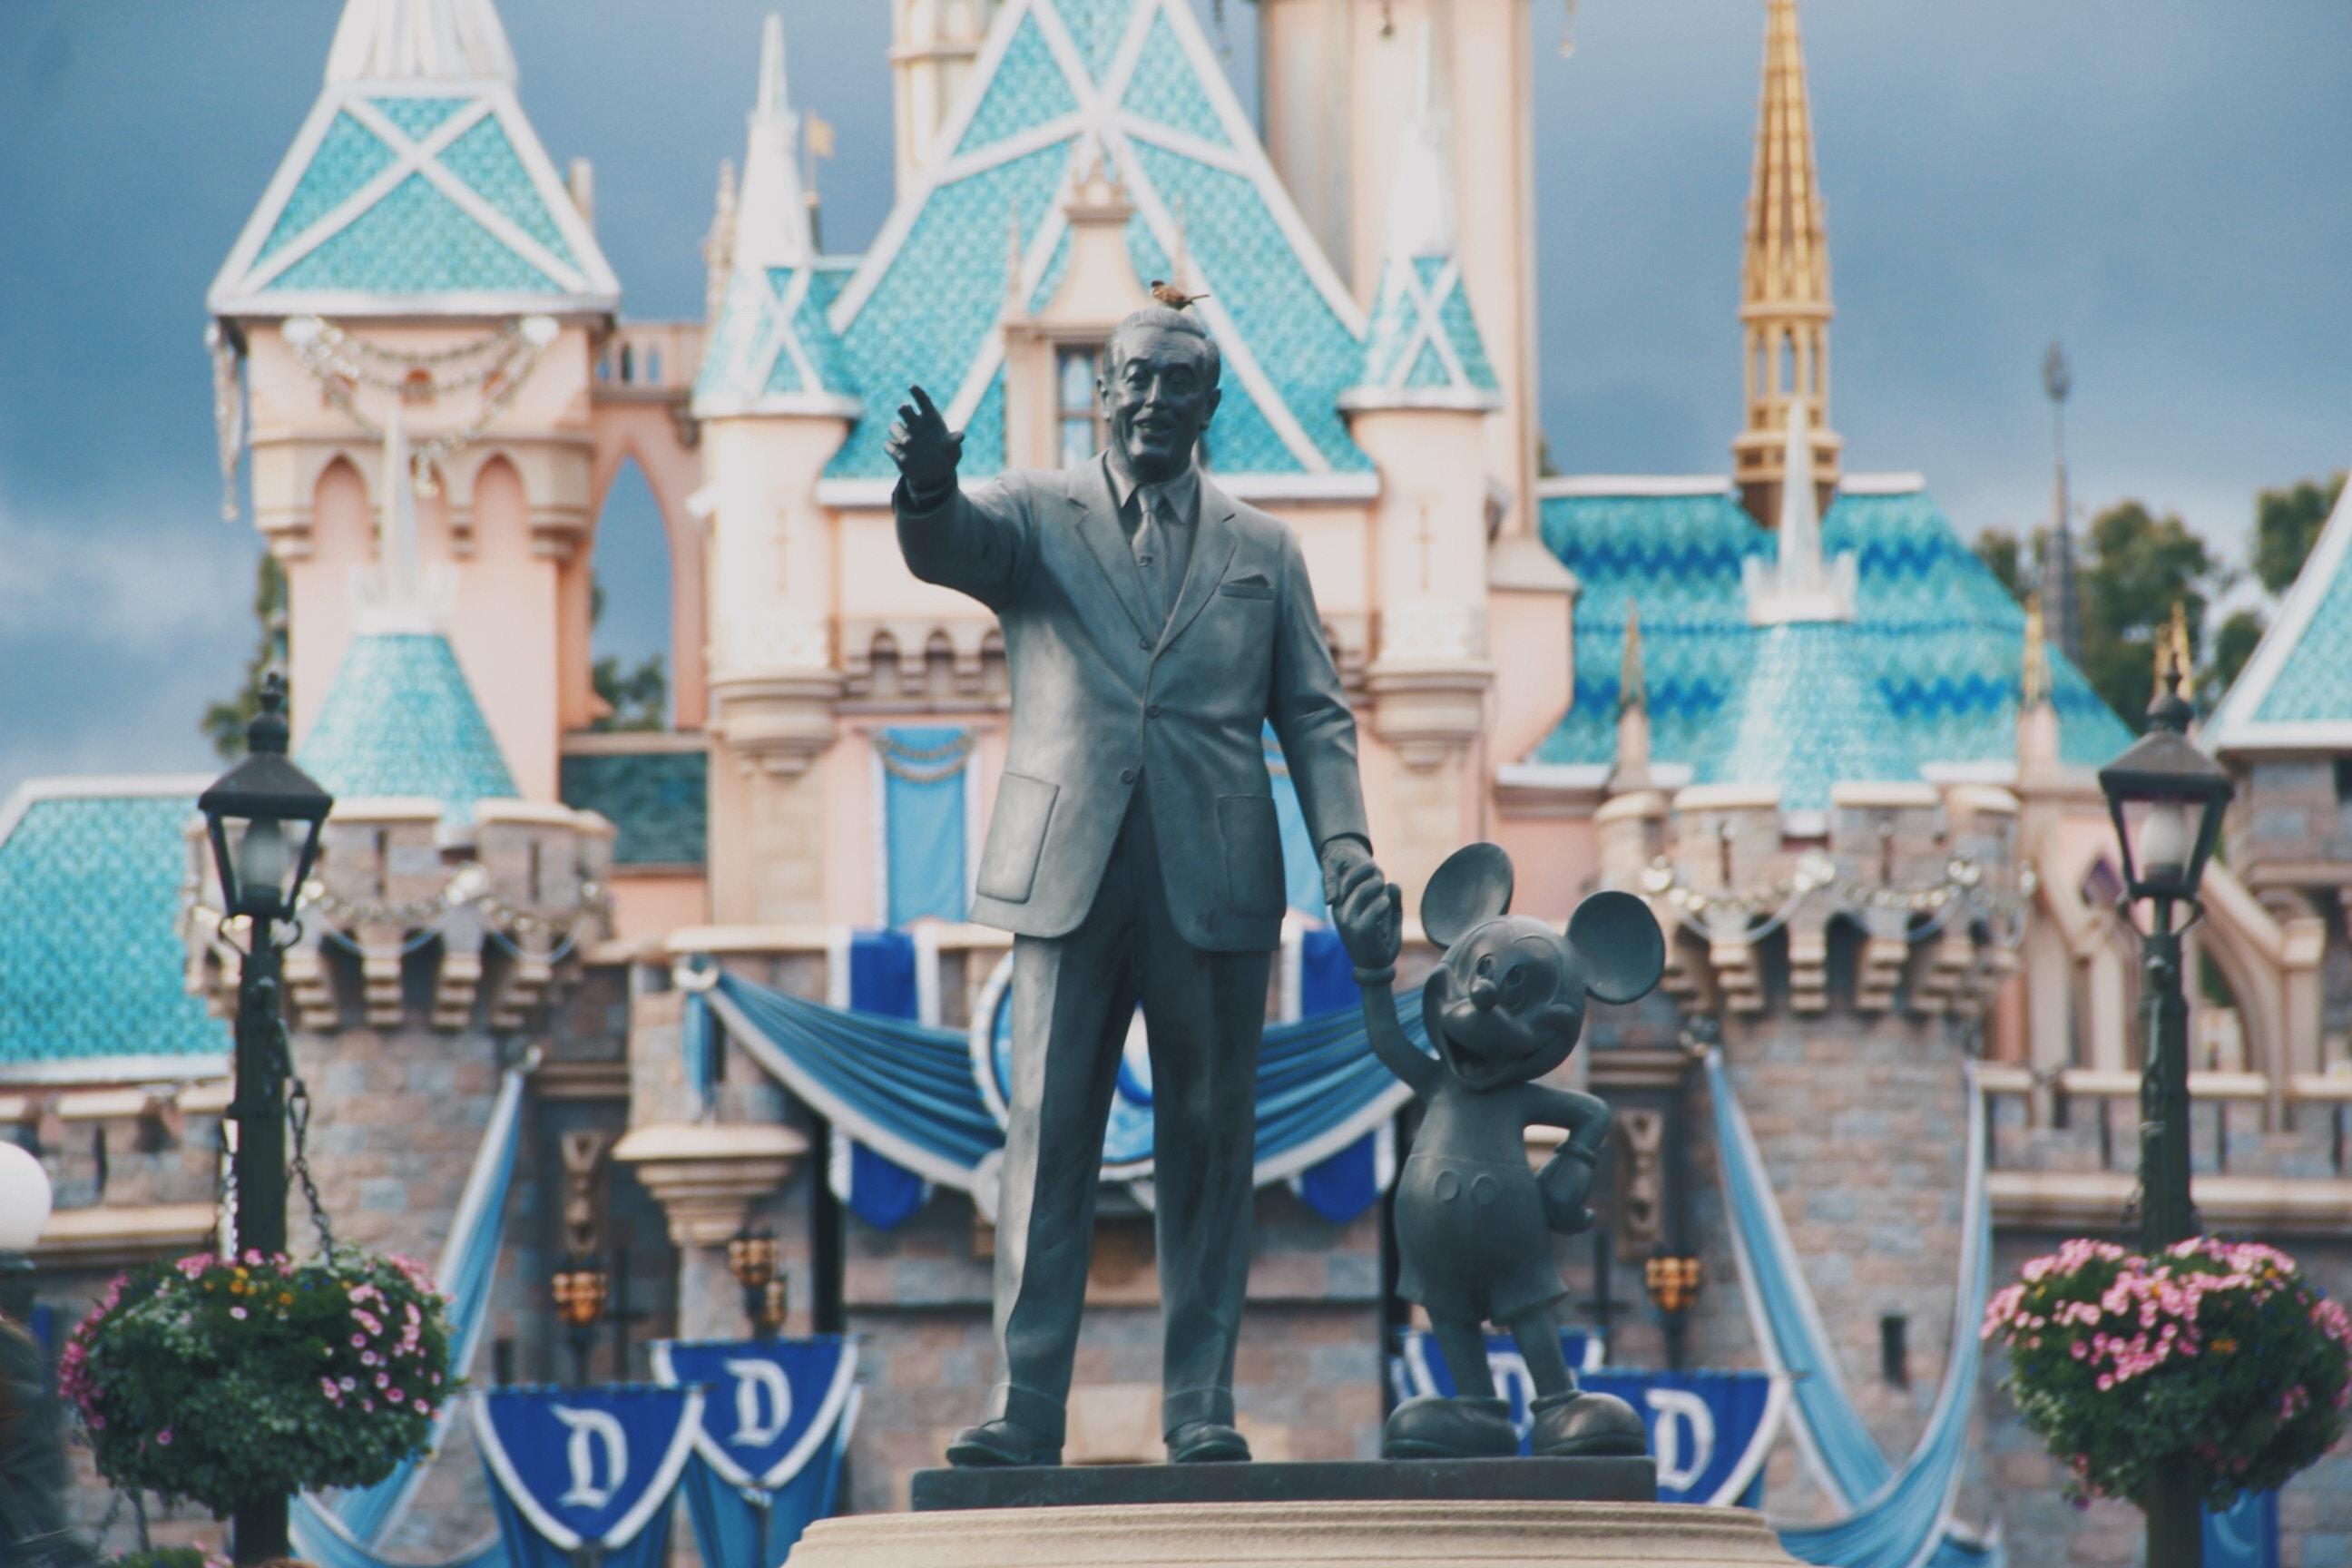 Dive into Walt Disney Day with Smashbomb